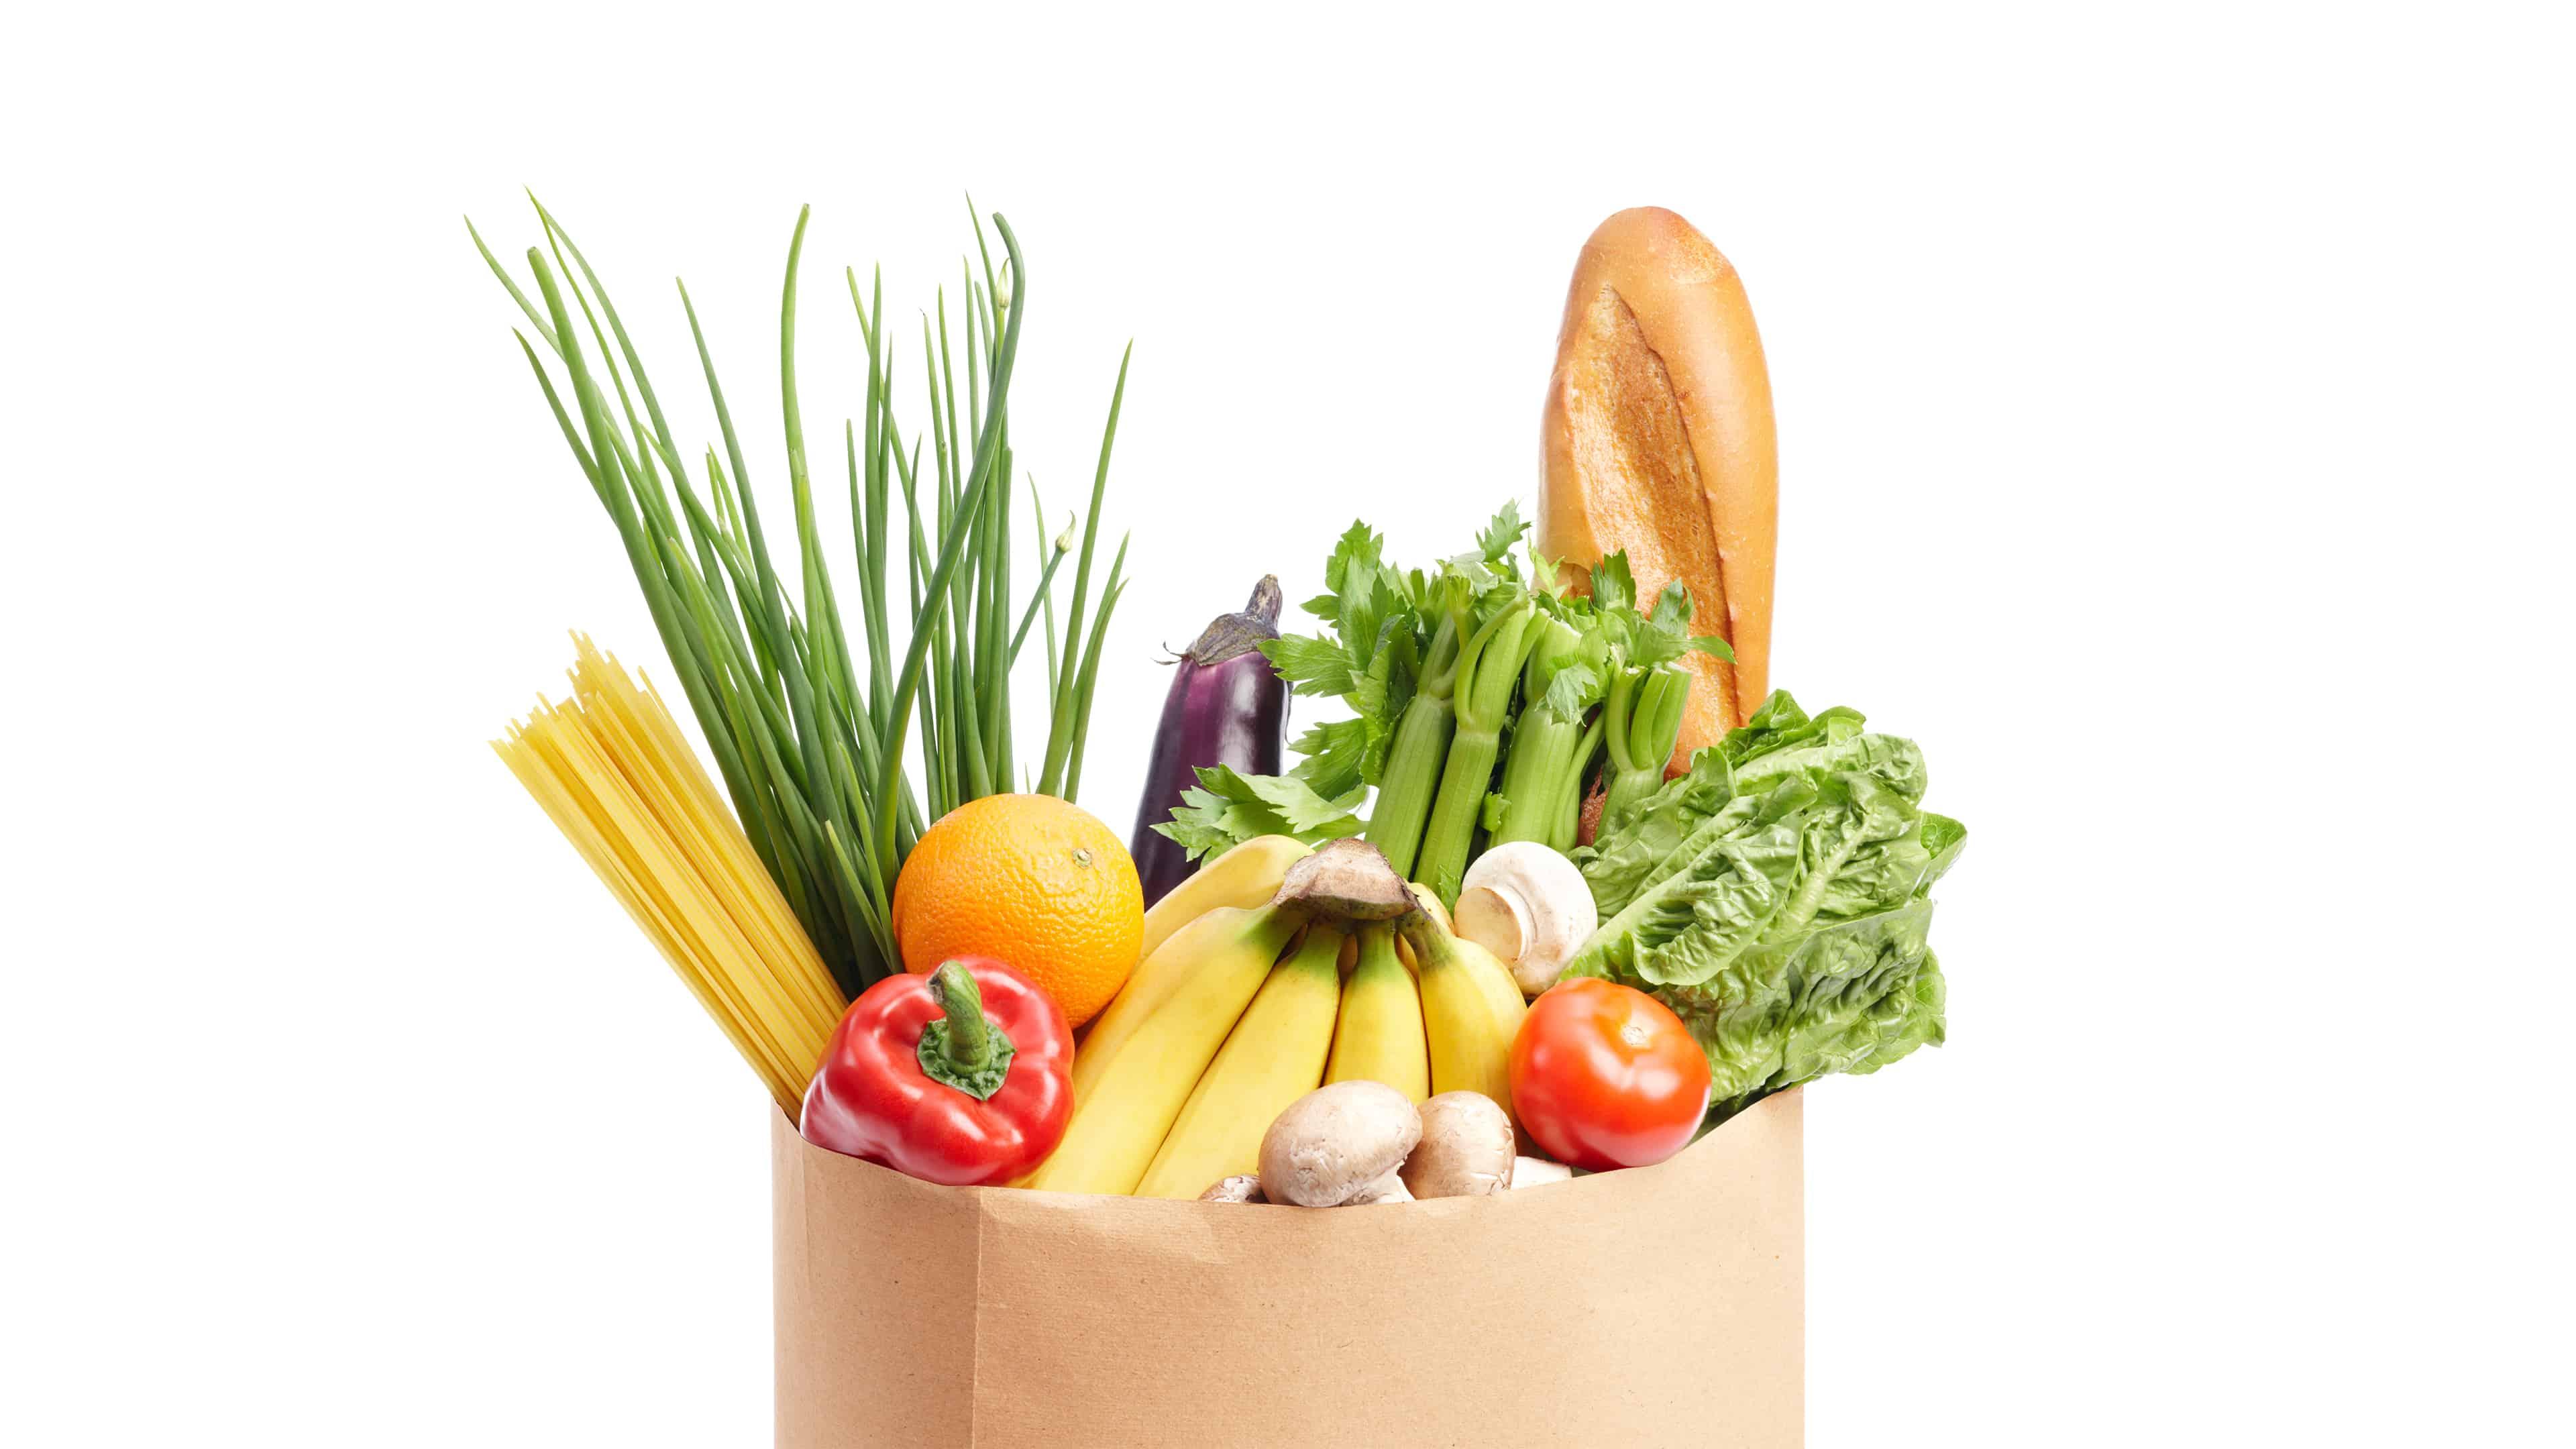 healthy groceries uhd 4k wallpaper